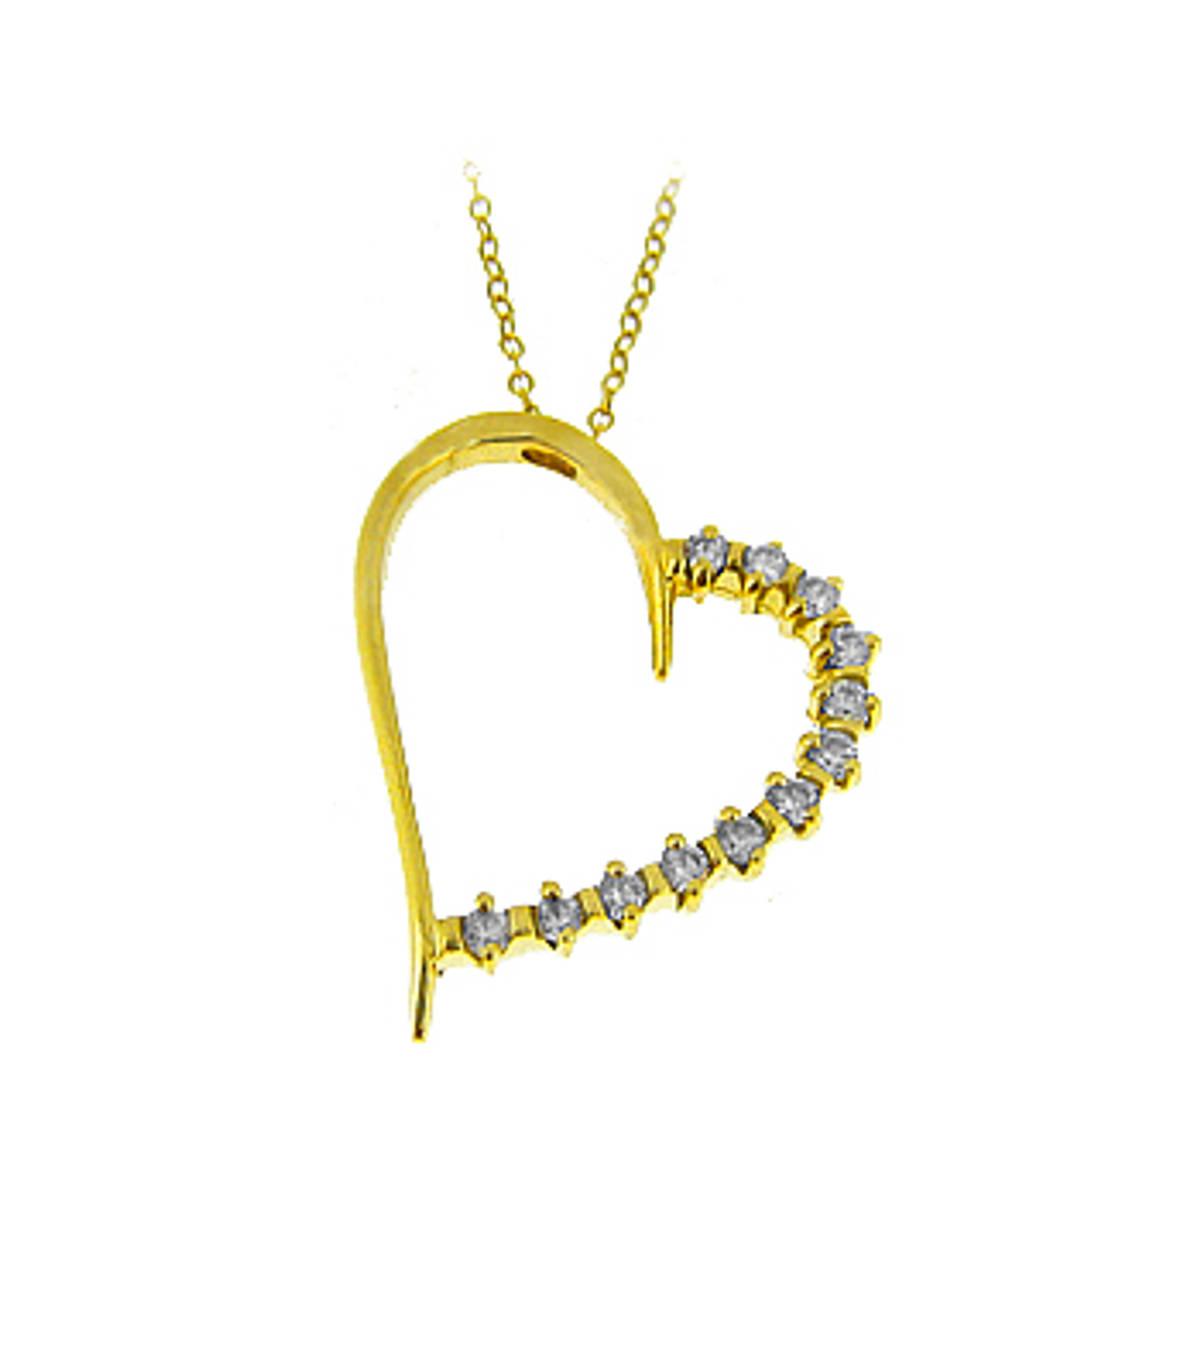 "9k yellow gold open heart CZ pendant on 9k yellow gold 18"" chain 9k yellow gold 18"" chainMetal: 9k yellow gold Length  2.9cm  Width  2.1cm Made in Ireland"